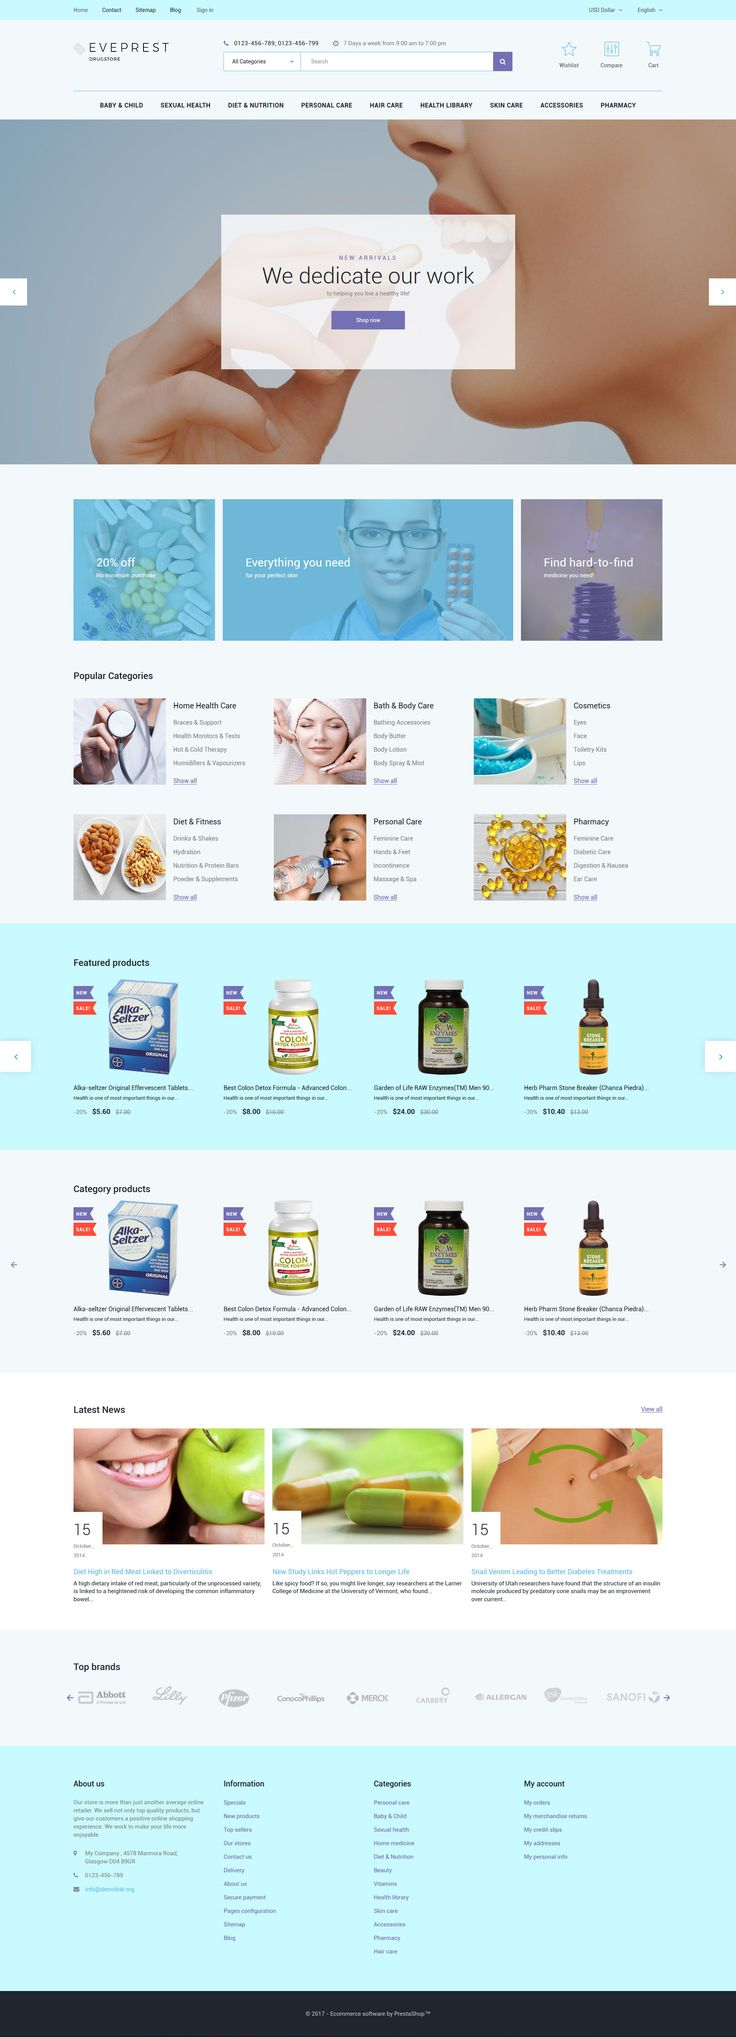 Eveprest - Drugstore Responsive Prestashop Theme